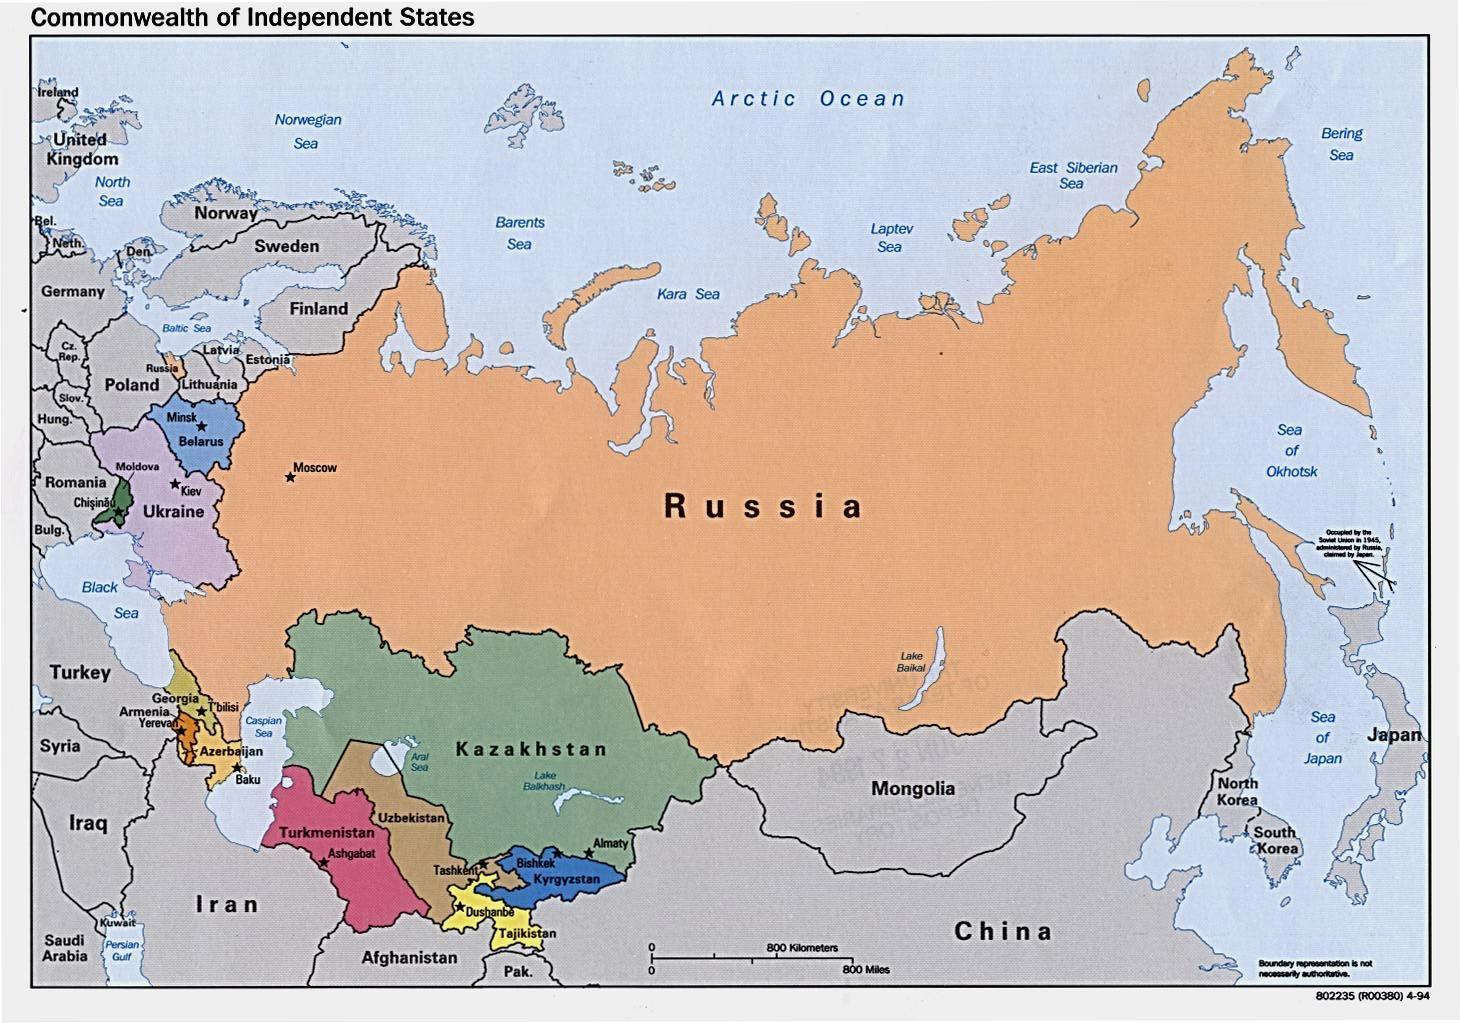 Rusland Mongoliet Kort Kort Over Rusland Mongoliet Ostlige